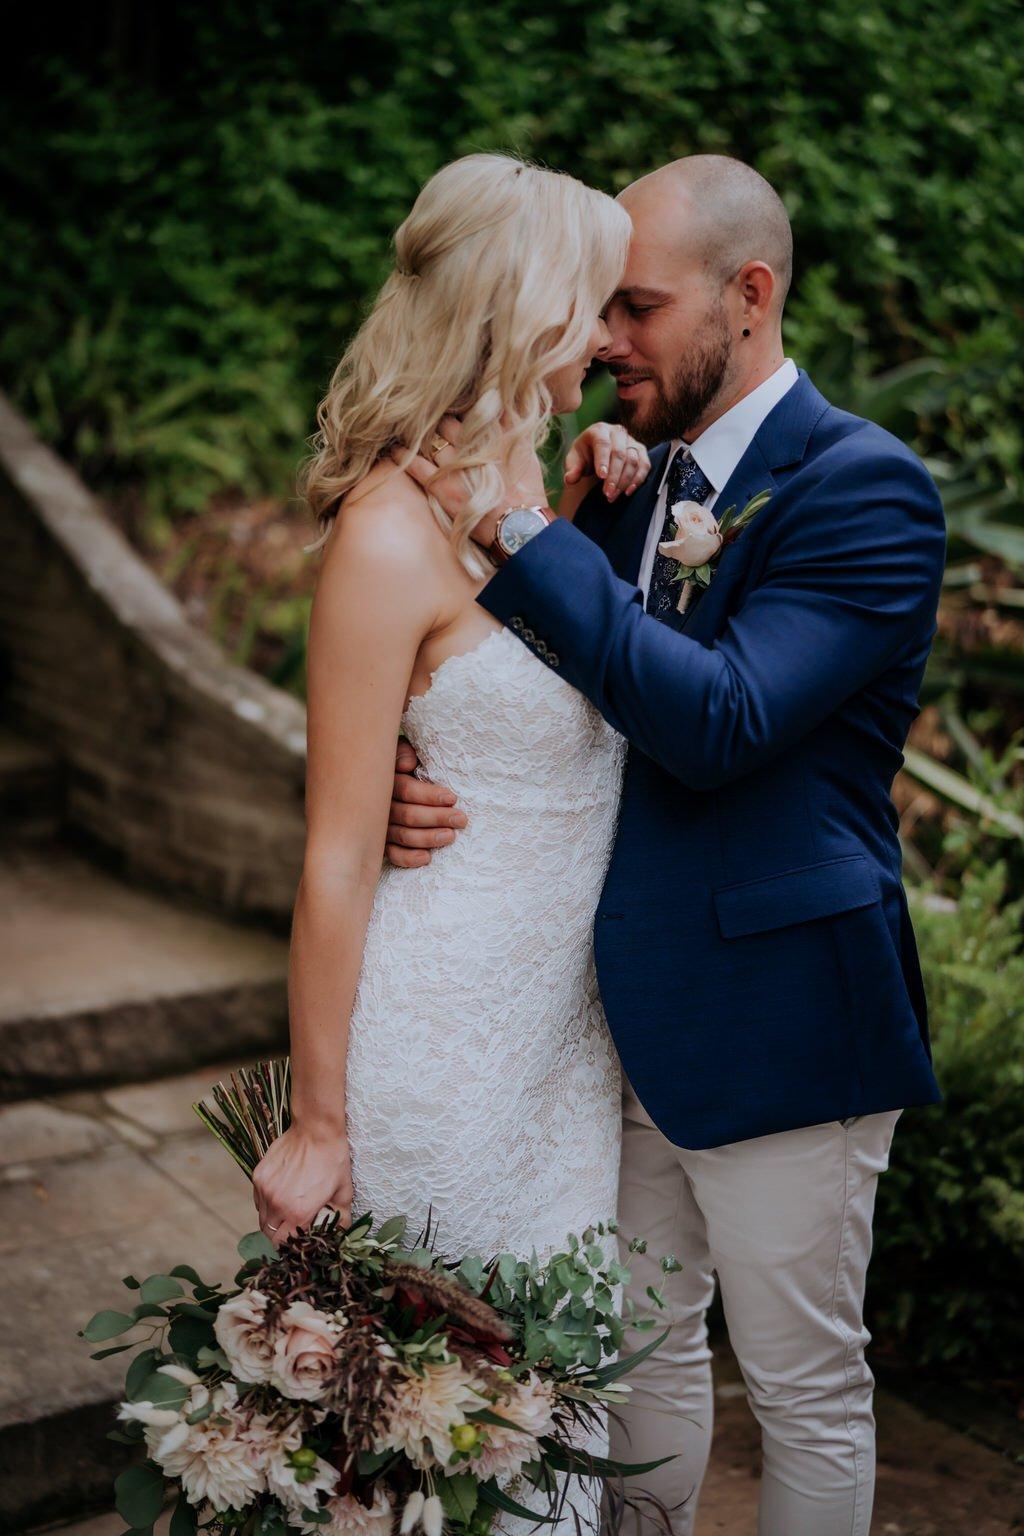 ava-me-photography-jade-simon-loxley-bellbird-hill-kurrajong-heights-wedding-696